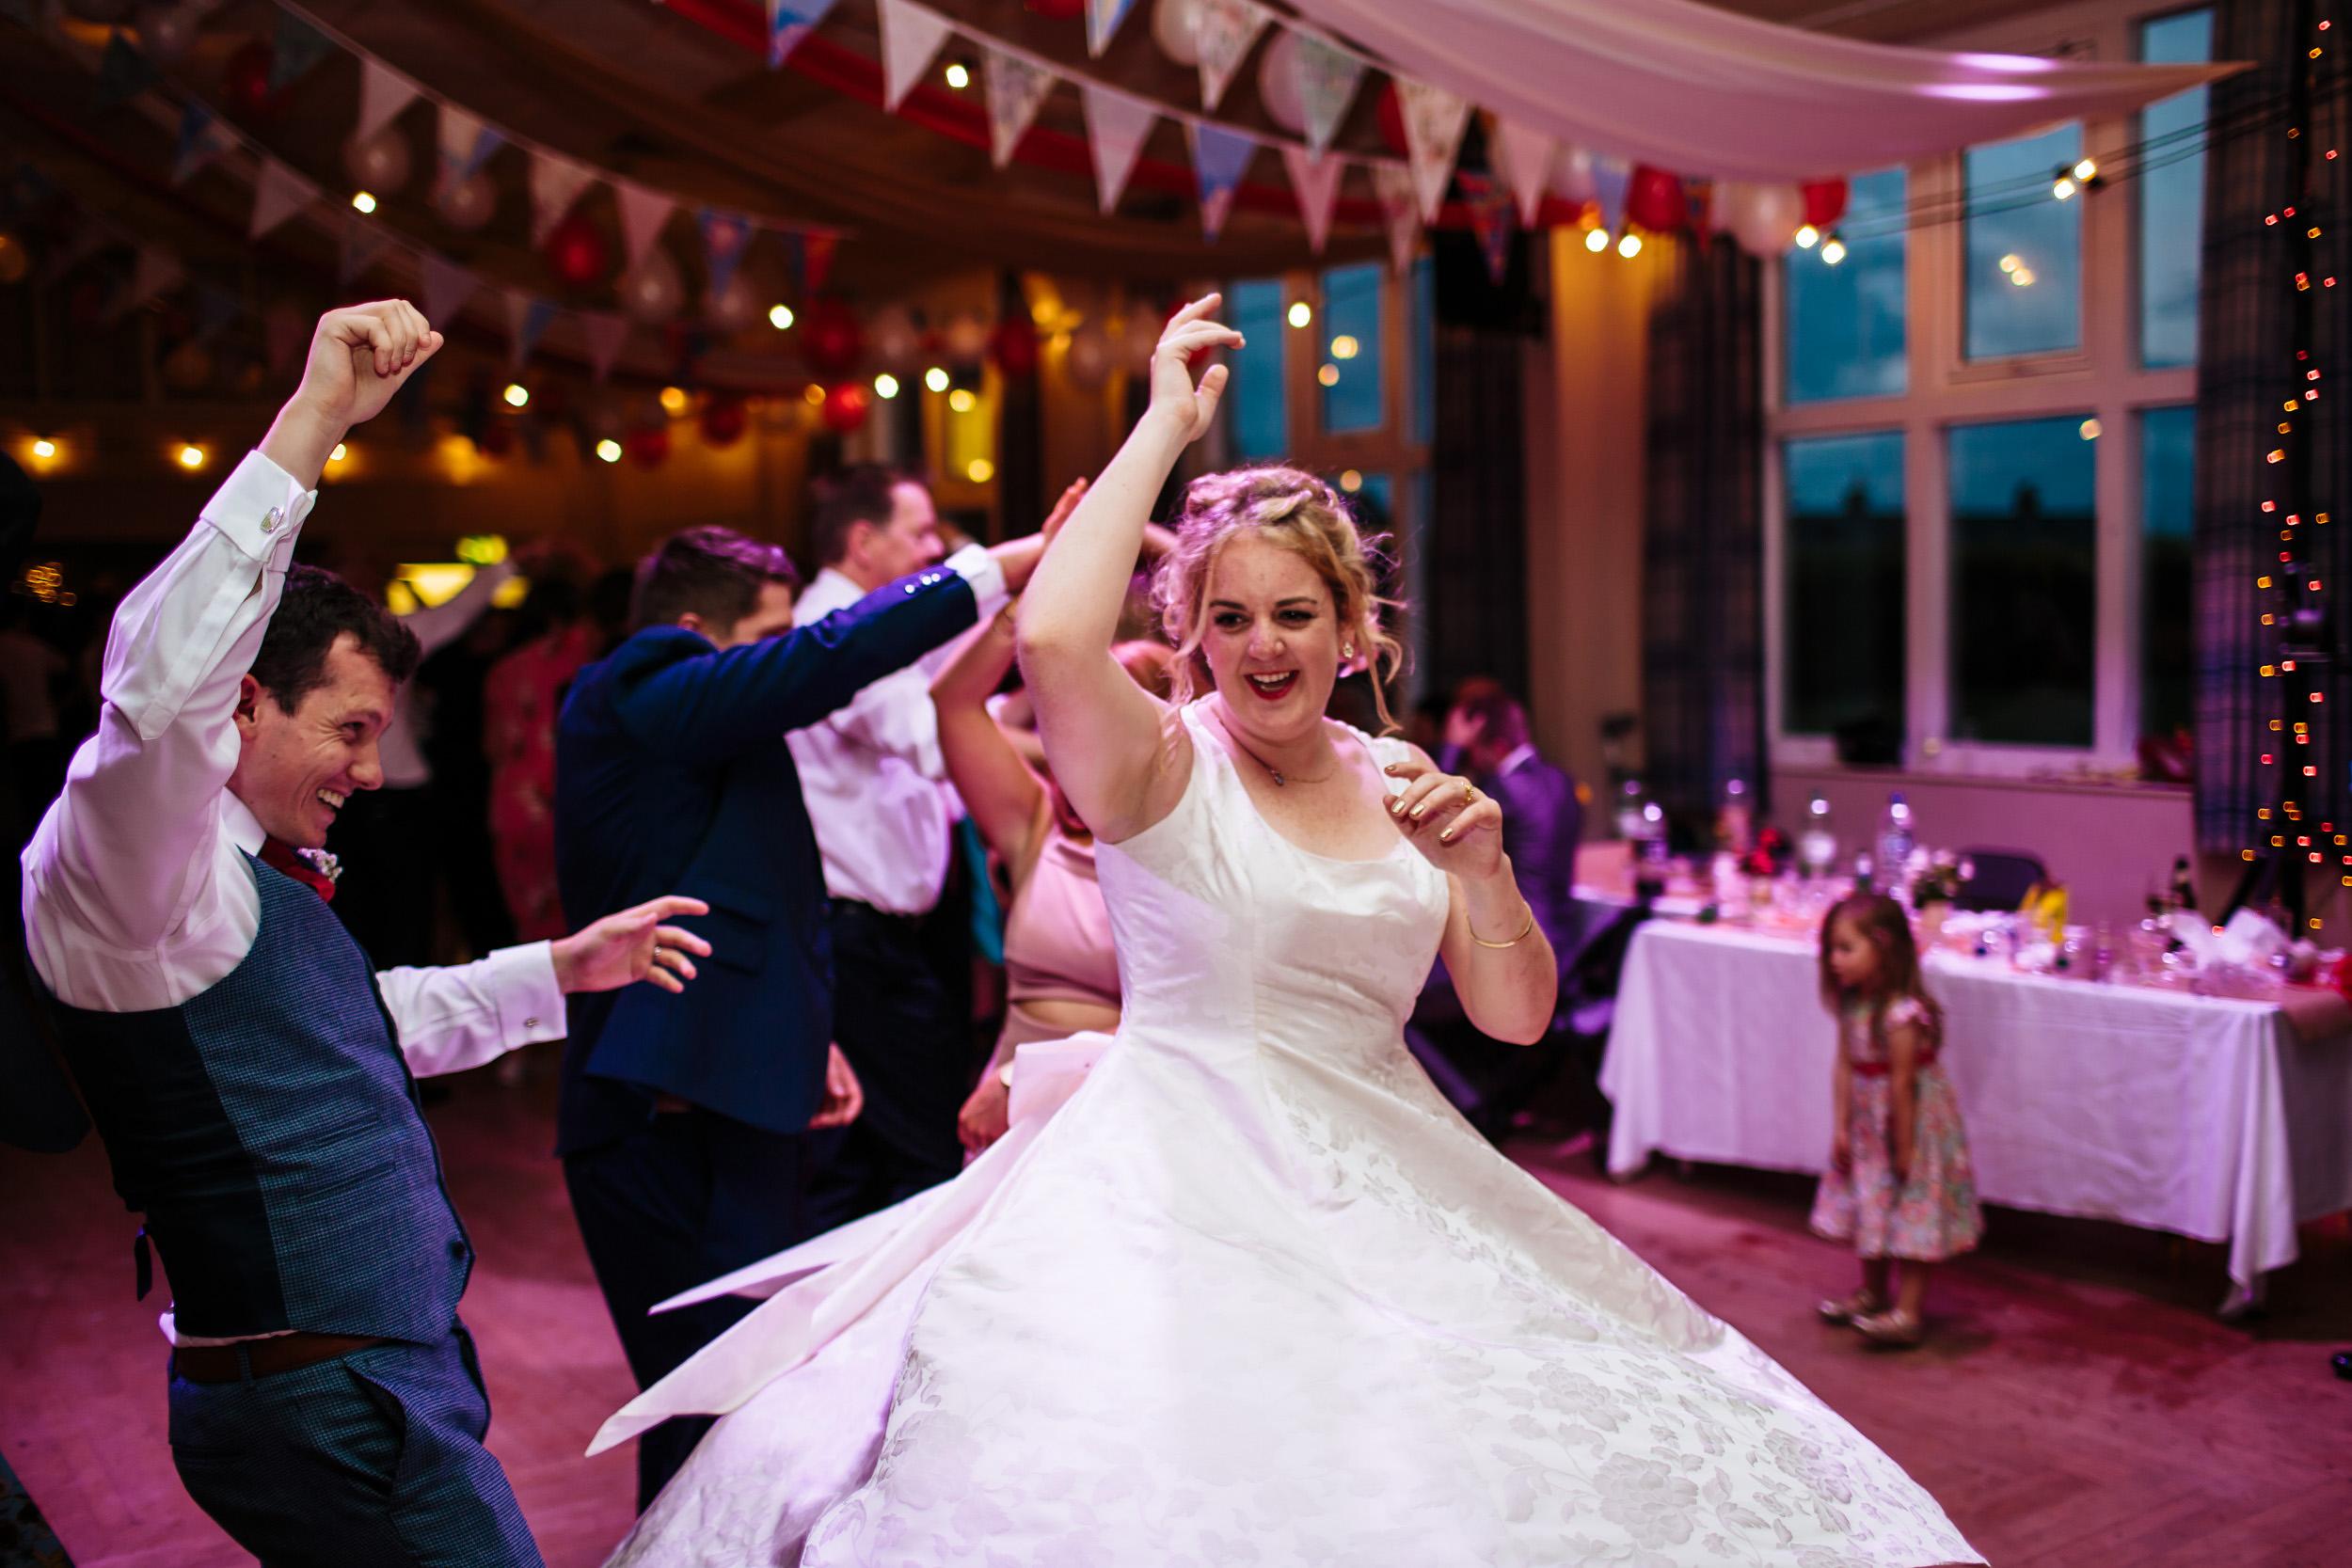 Bride ceilidh dancing at her wedding